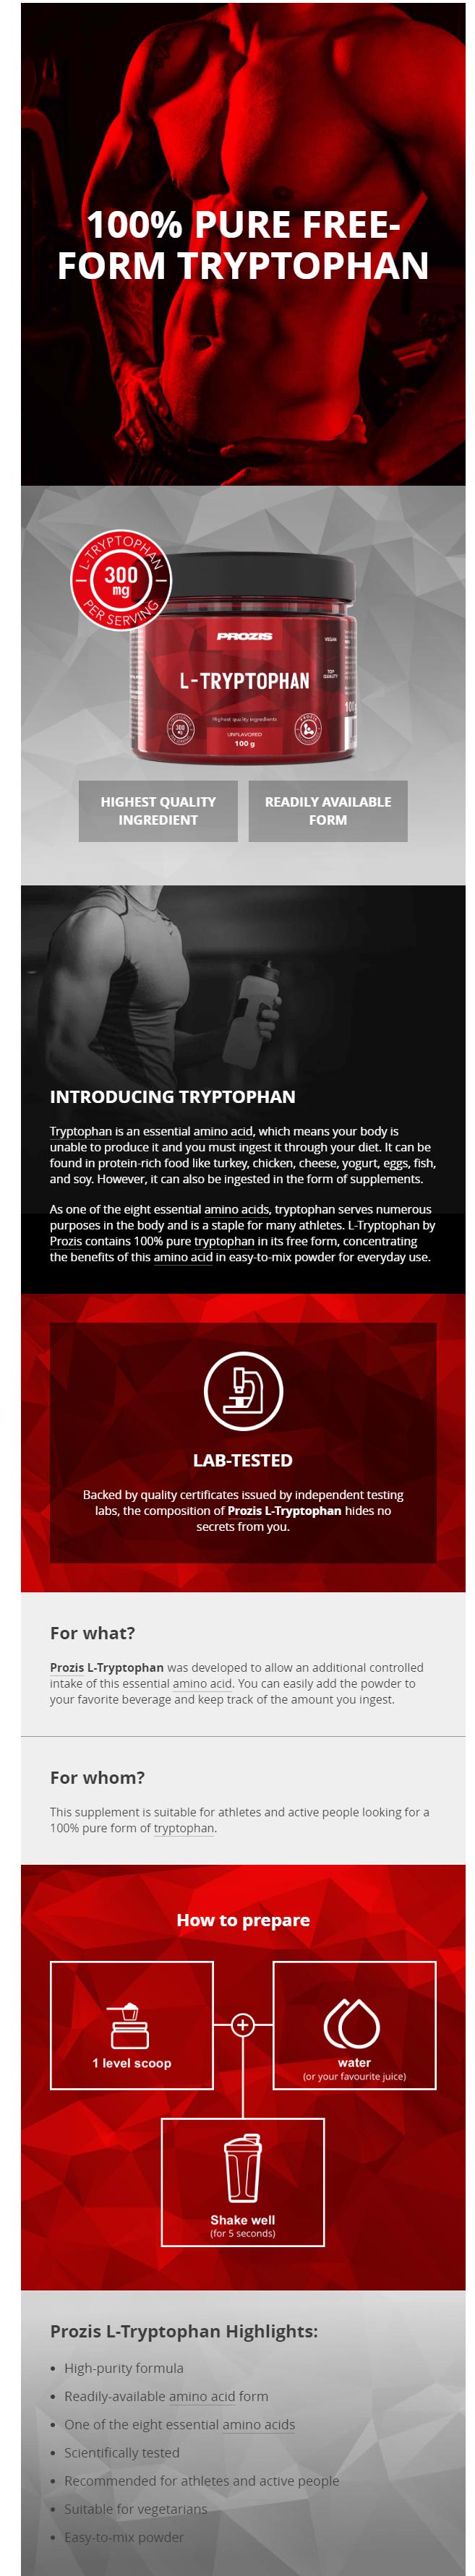 Представяне на Prozis L-Tryptophan